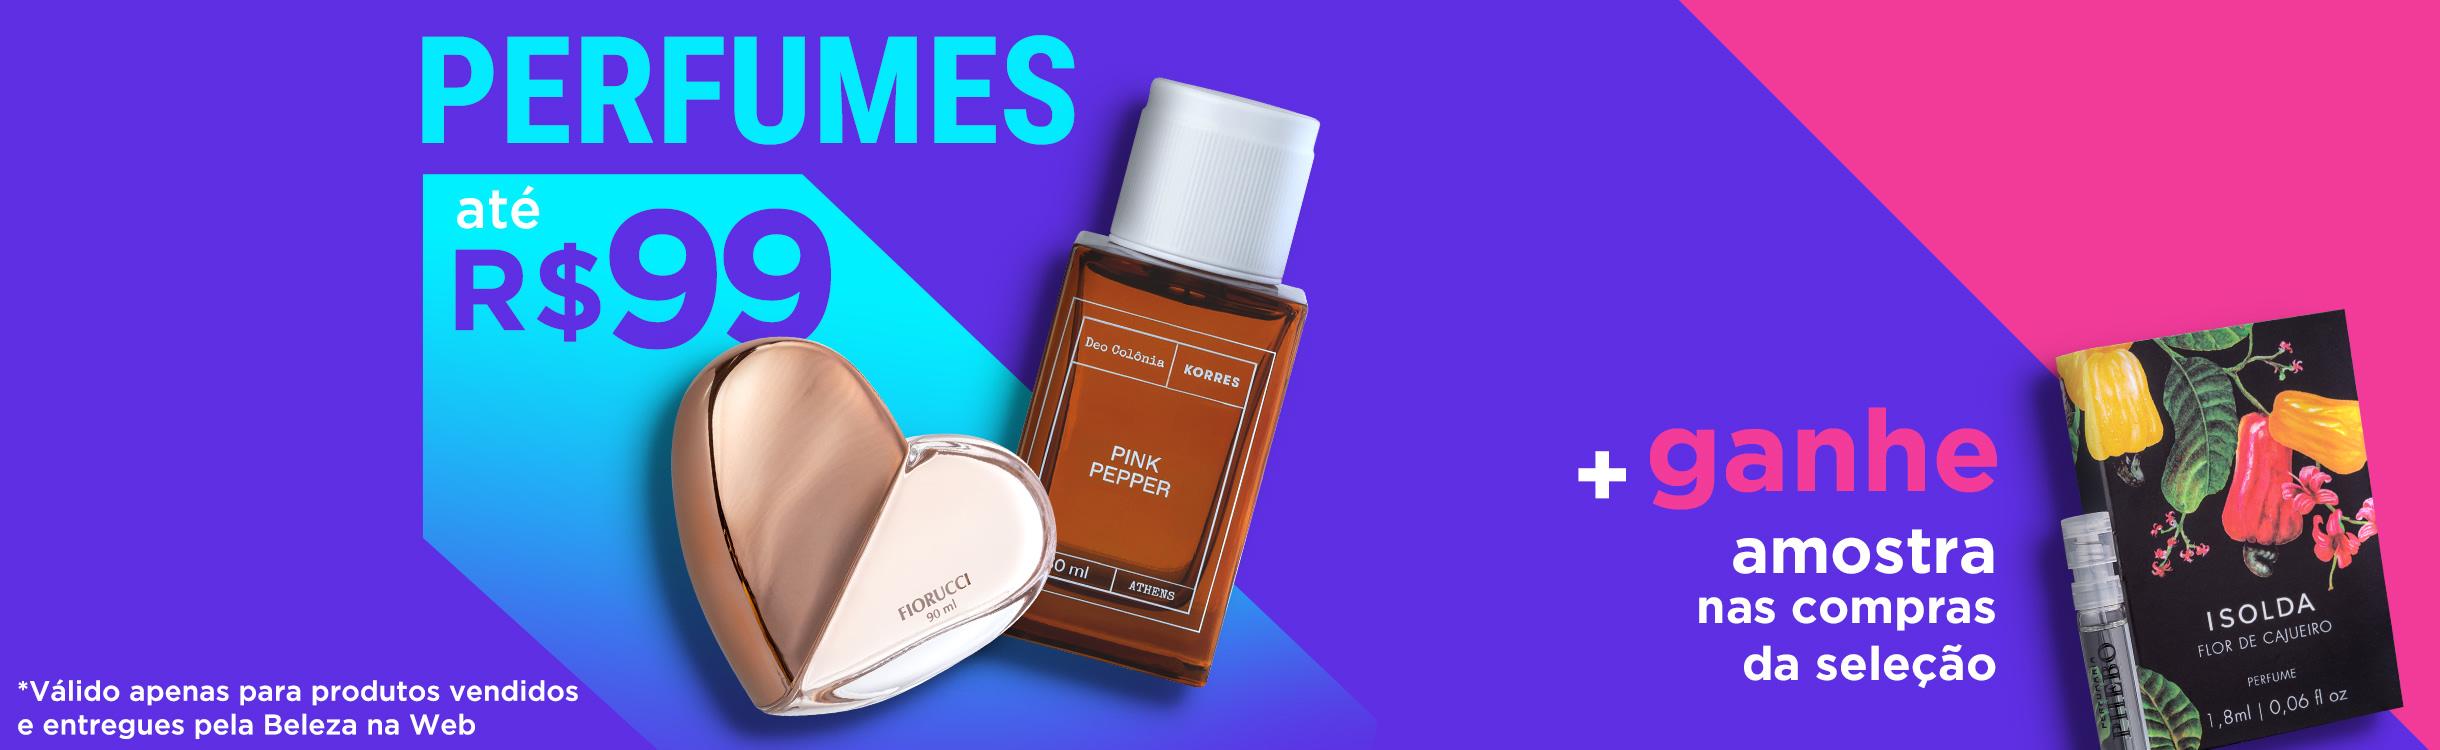 Perfumes e Perfumaria até R$99